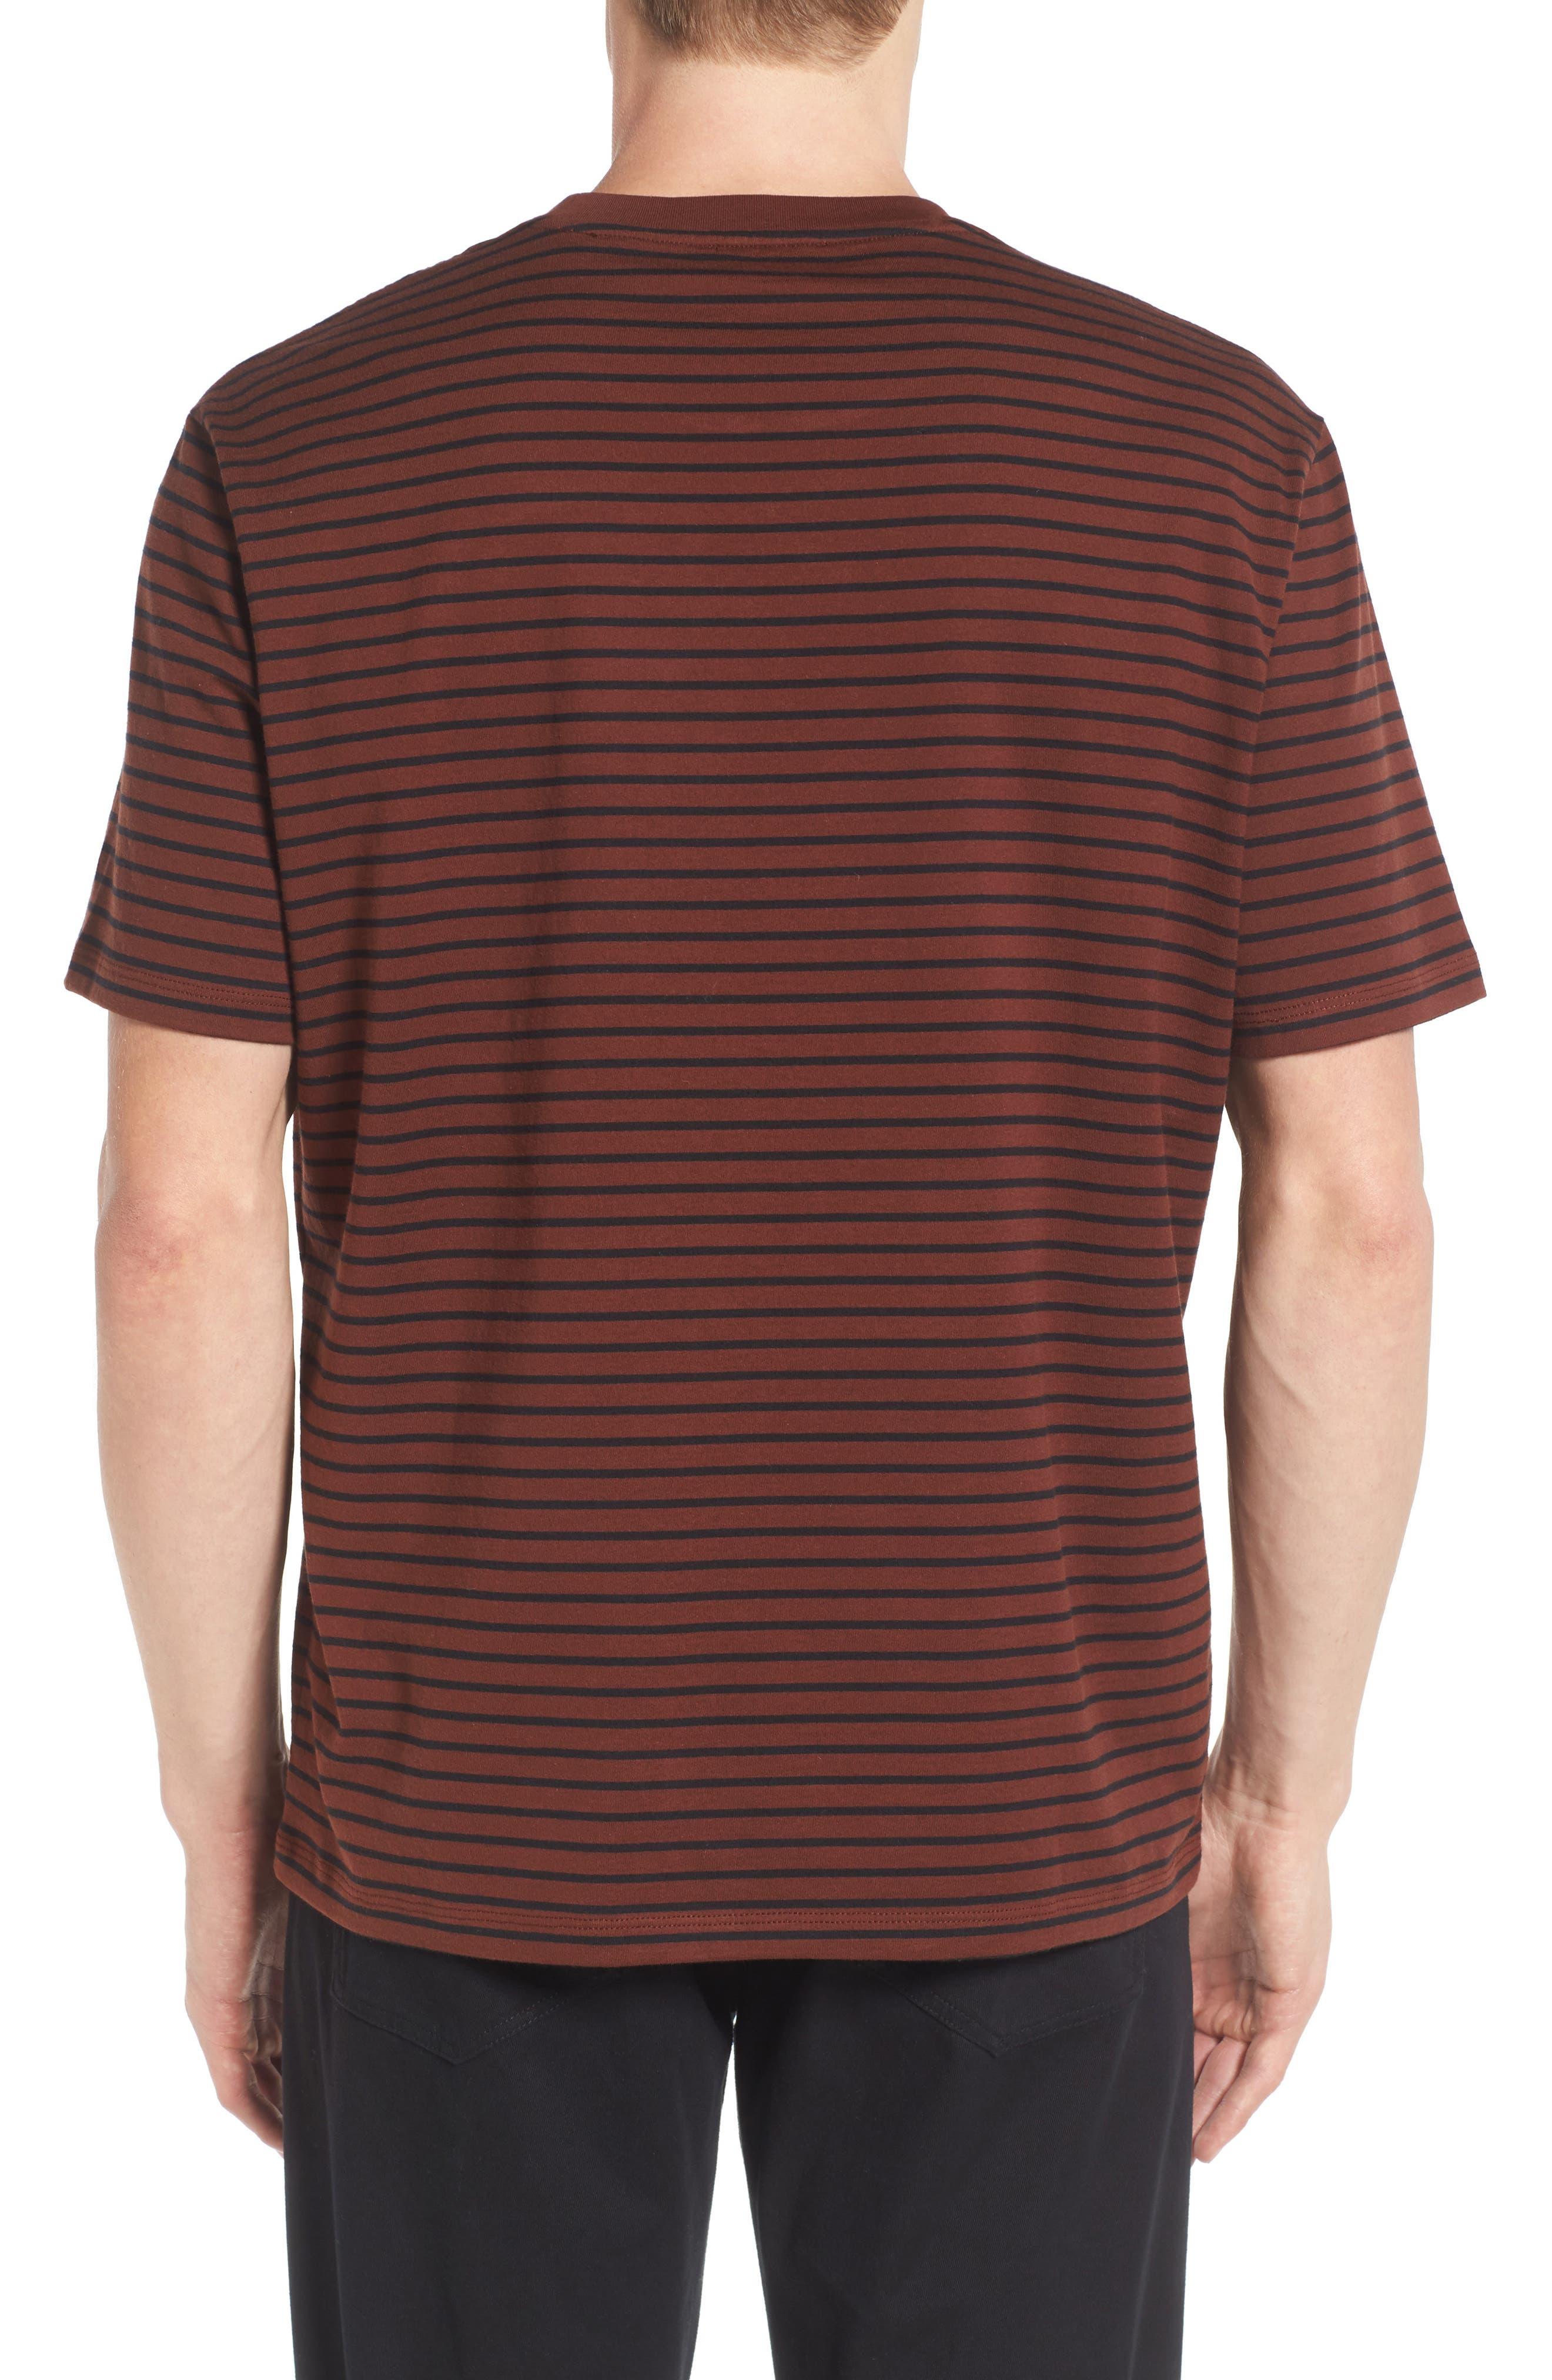 Narrow Stripe Pima Cotton T-Shirt,                             Alternate thumbnail 2, color,                             Sienna/ Black